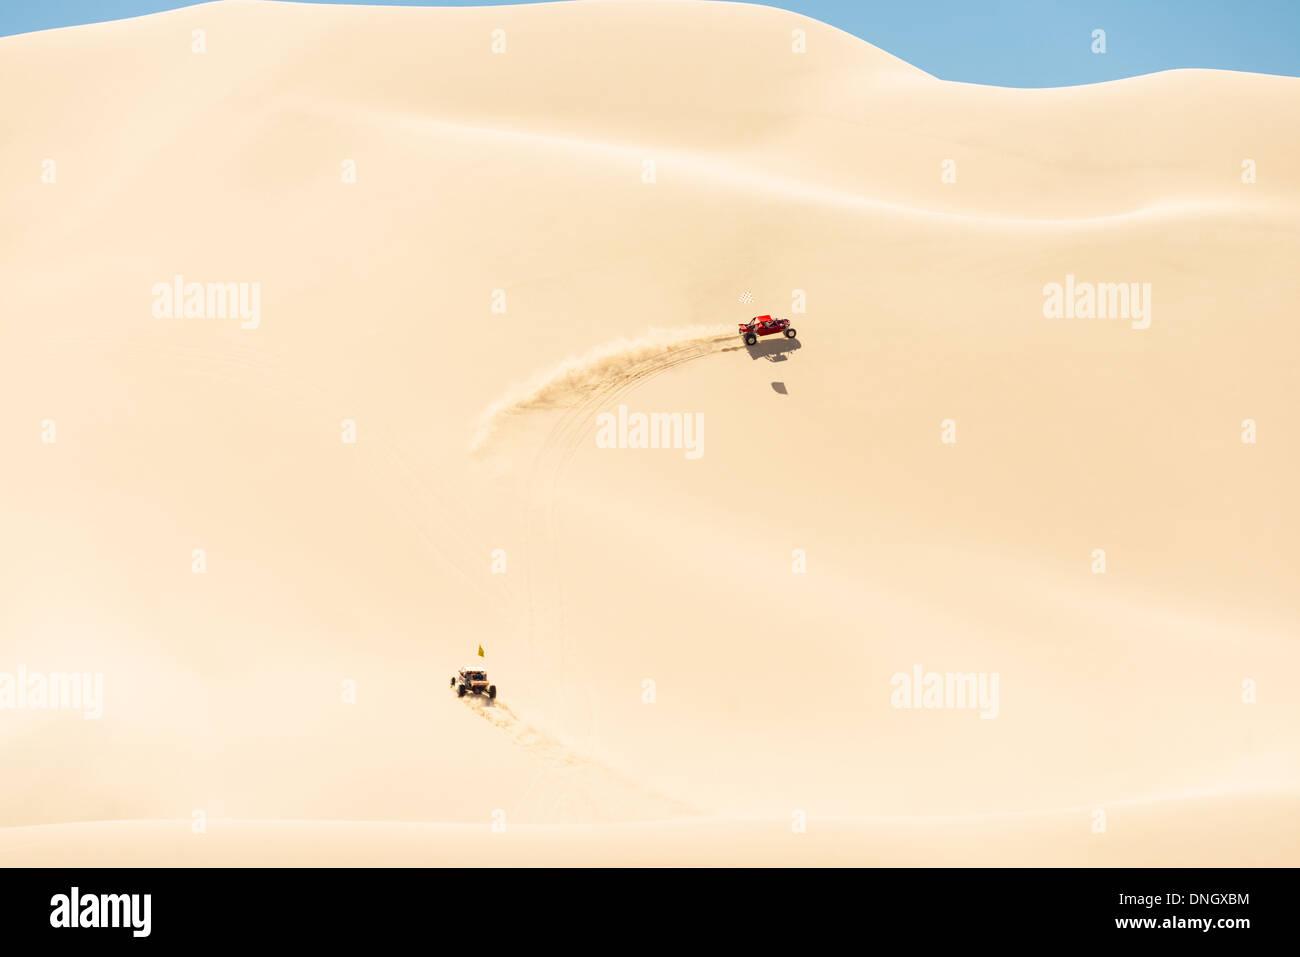 Buggy in the Dumont dunes - Stock Image